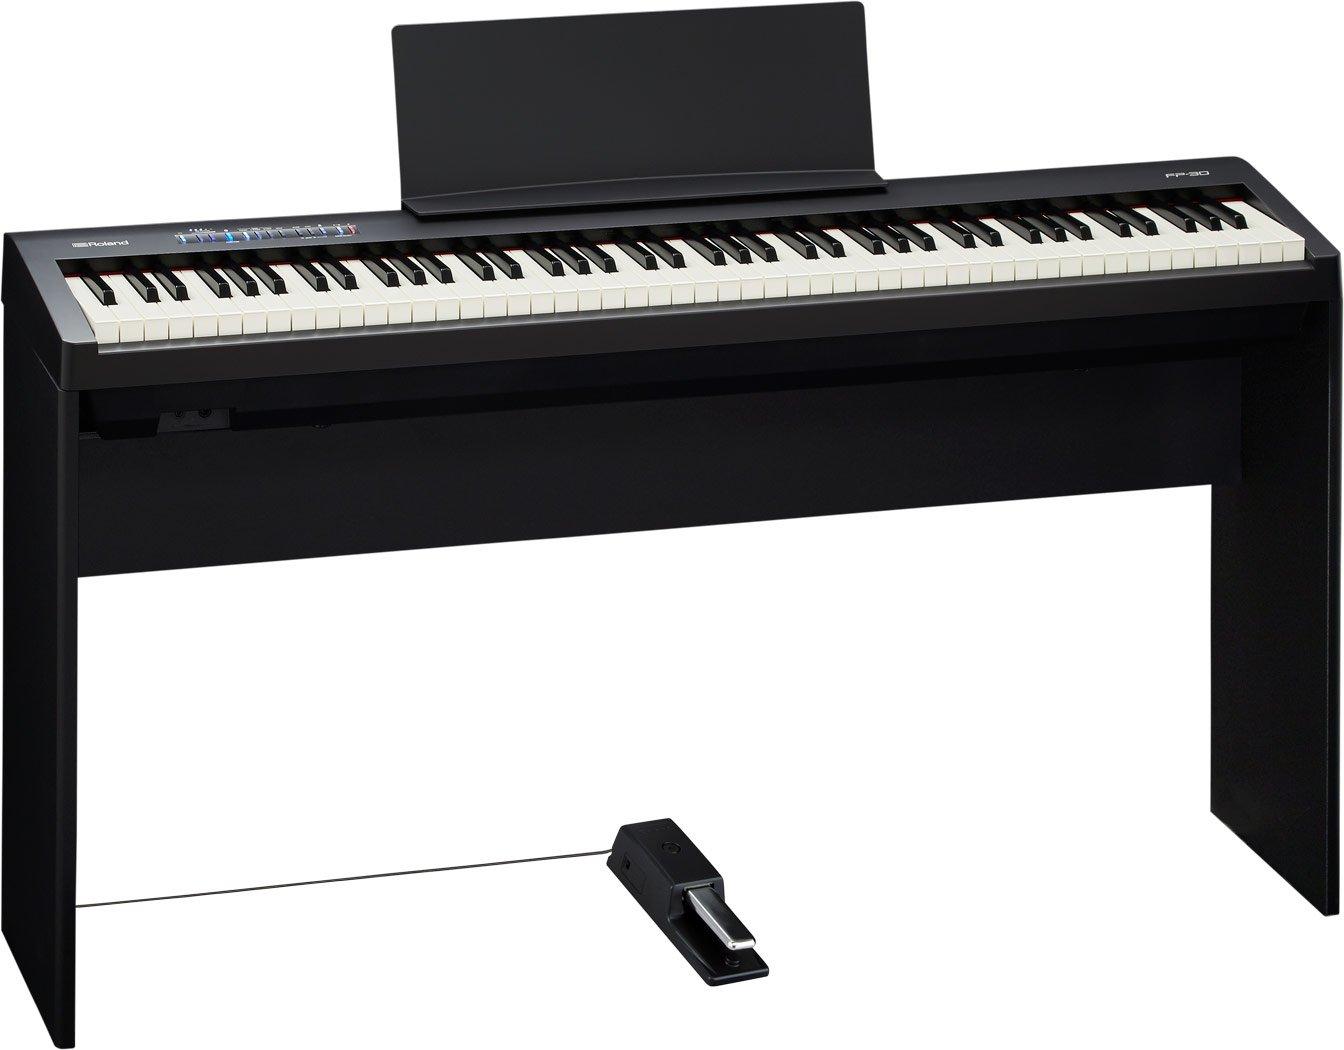 ROLAND 88-note Portable Digital Piano